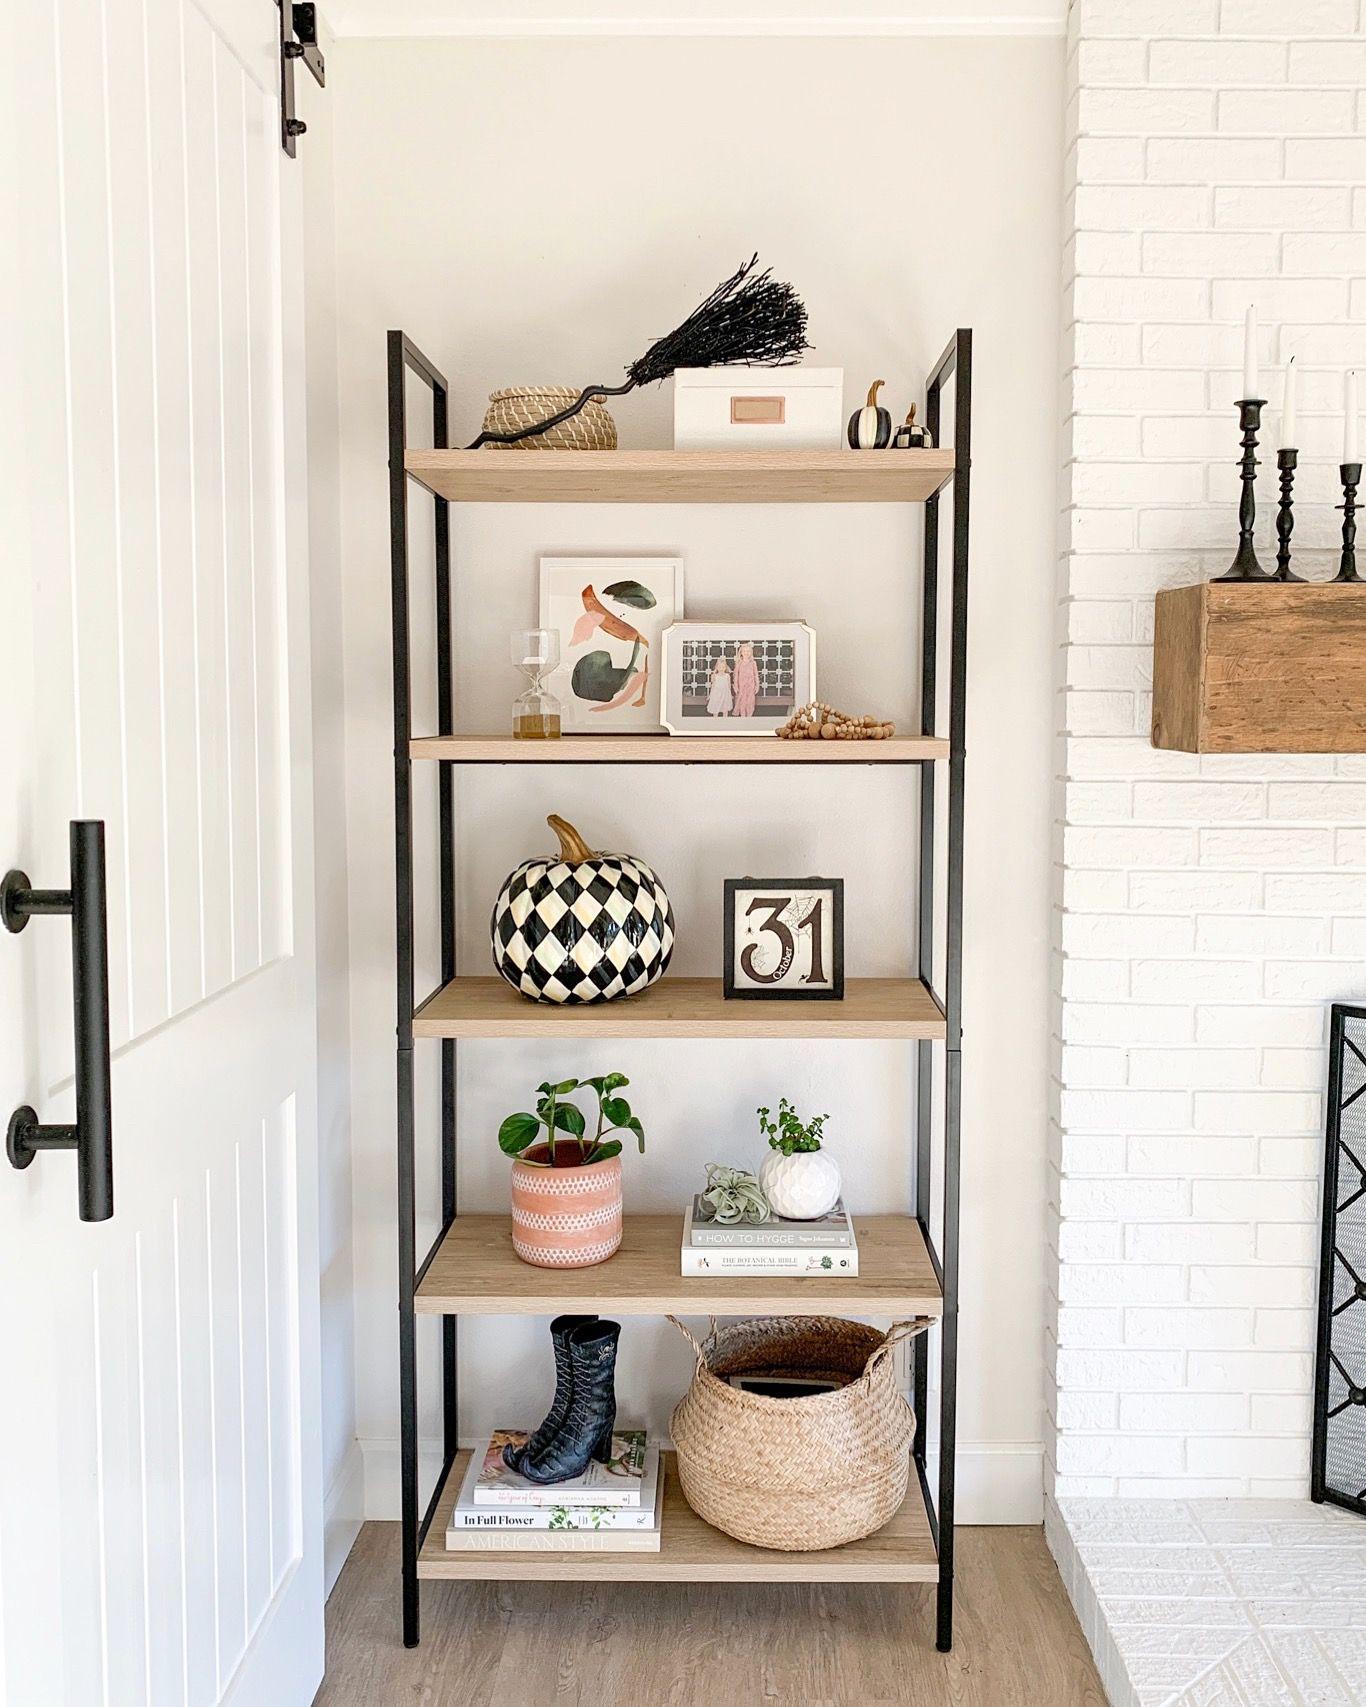 Halloween Shelf Styling for a Modern Farmhouse Bookshelf